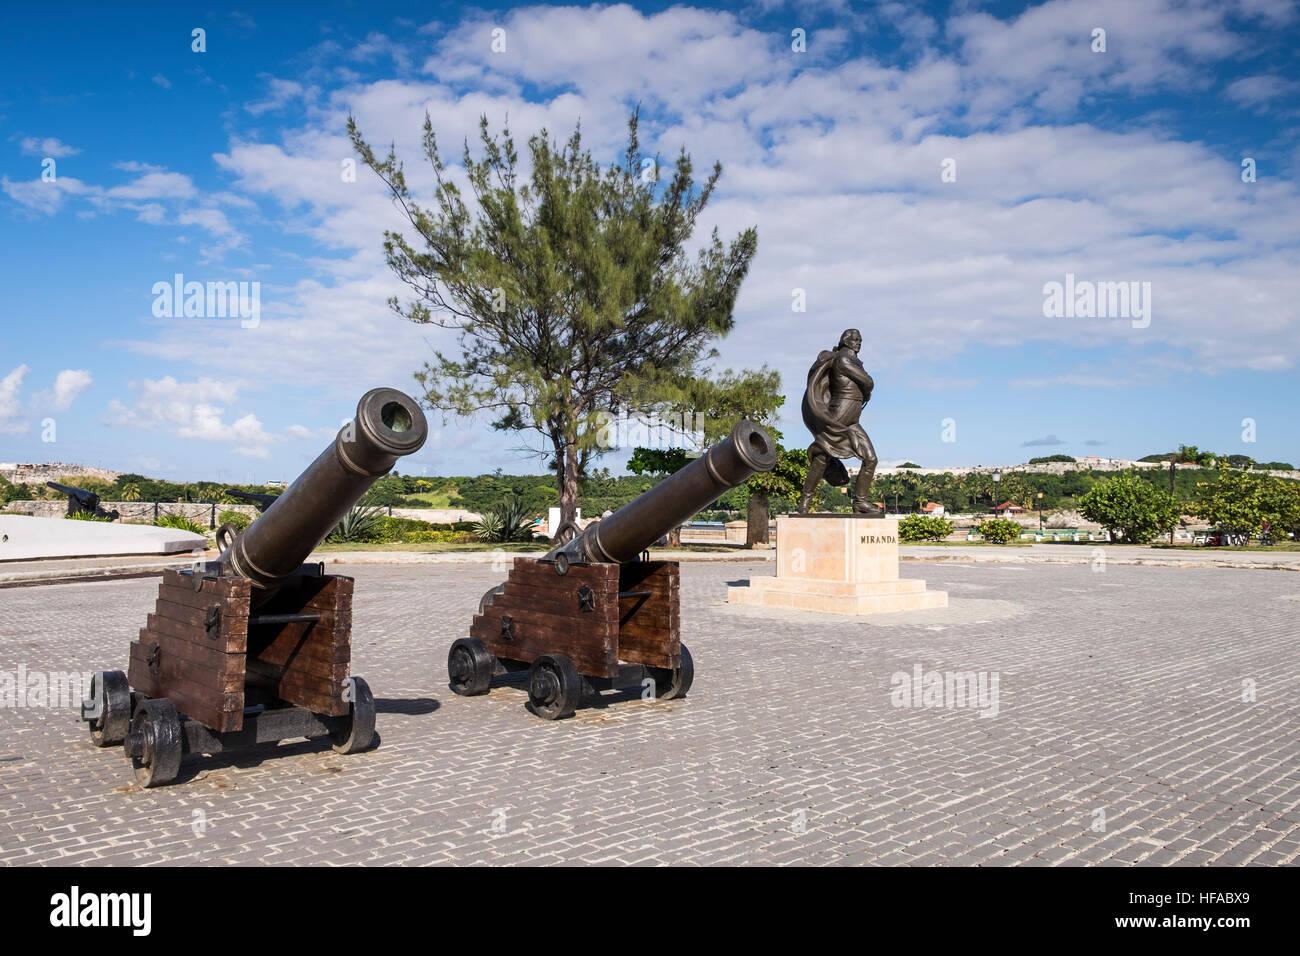 Cannons at the castillo de San salvador de la Punta, La Havana, Cuba. - Stock Image